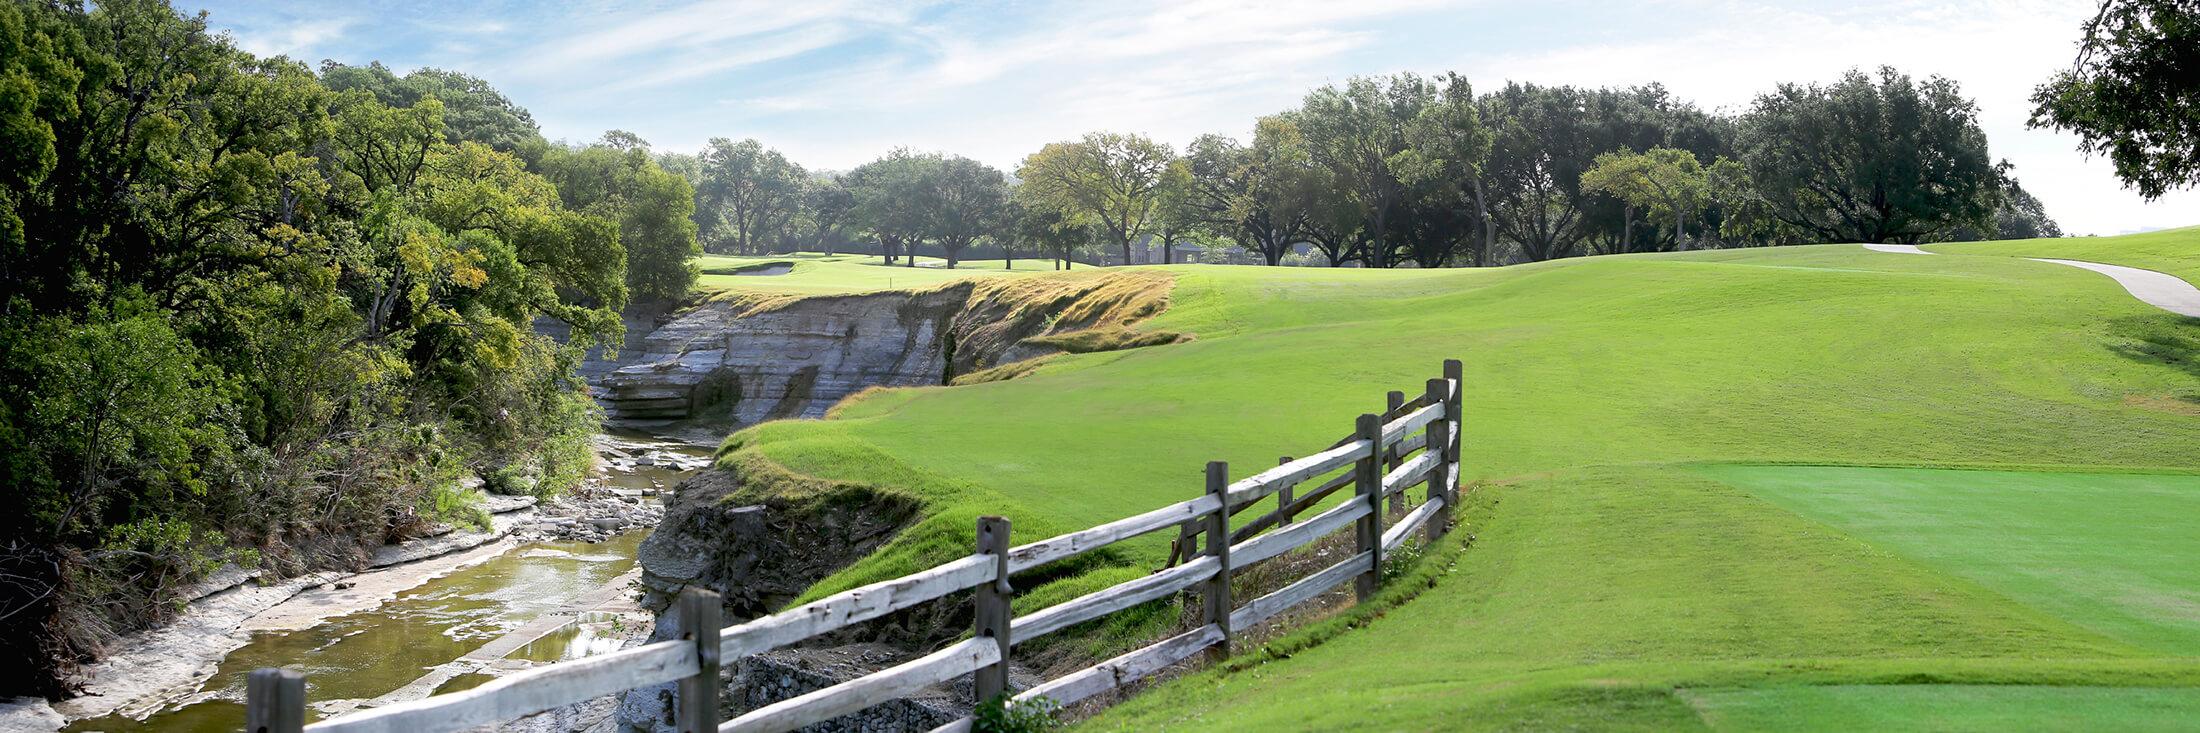 Golf Course Image - Northwood Club No. 14